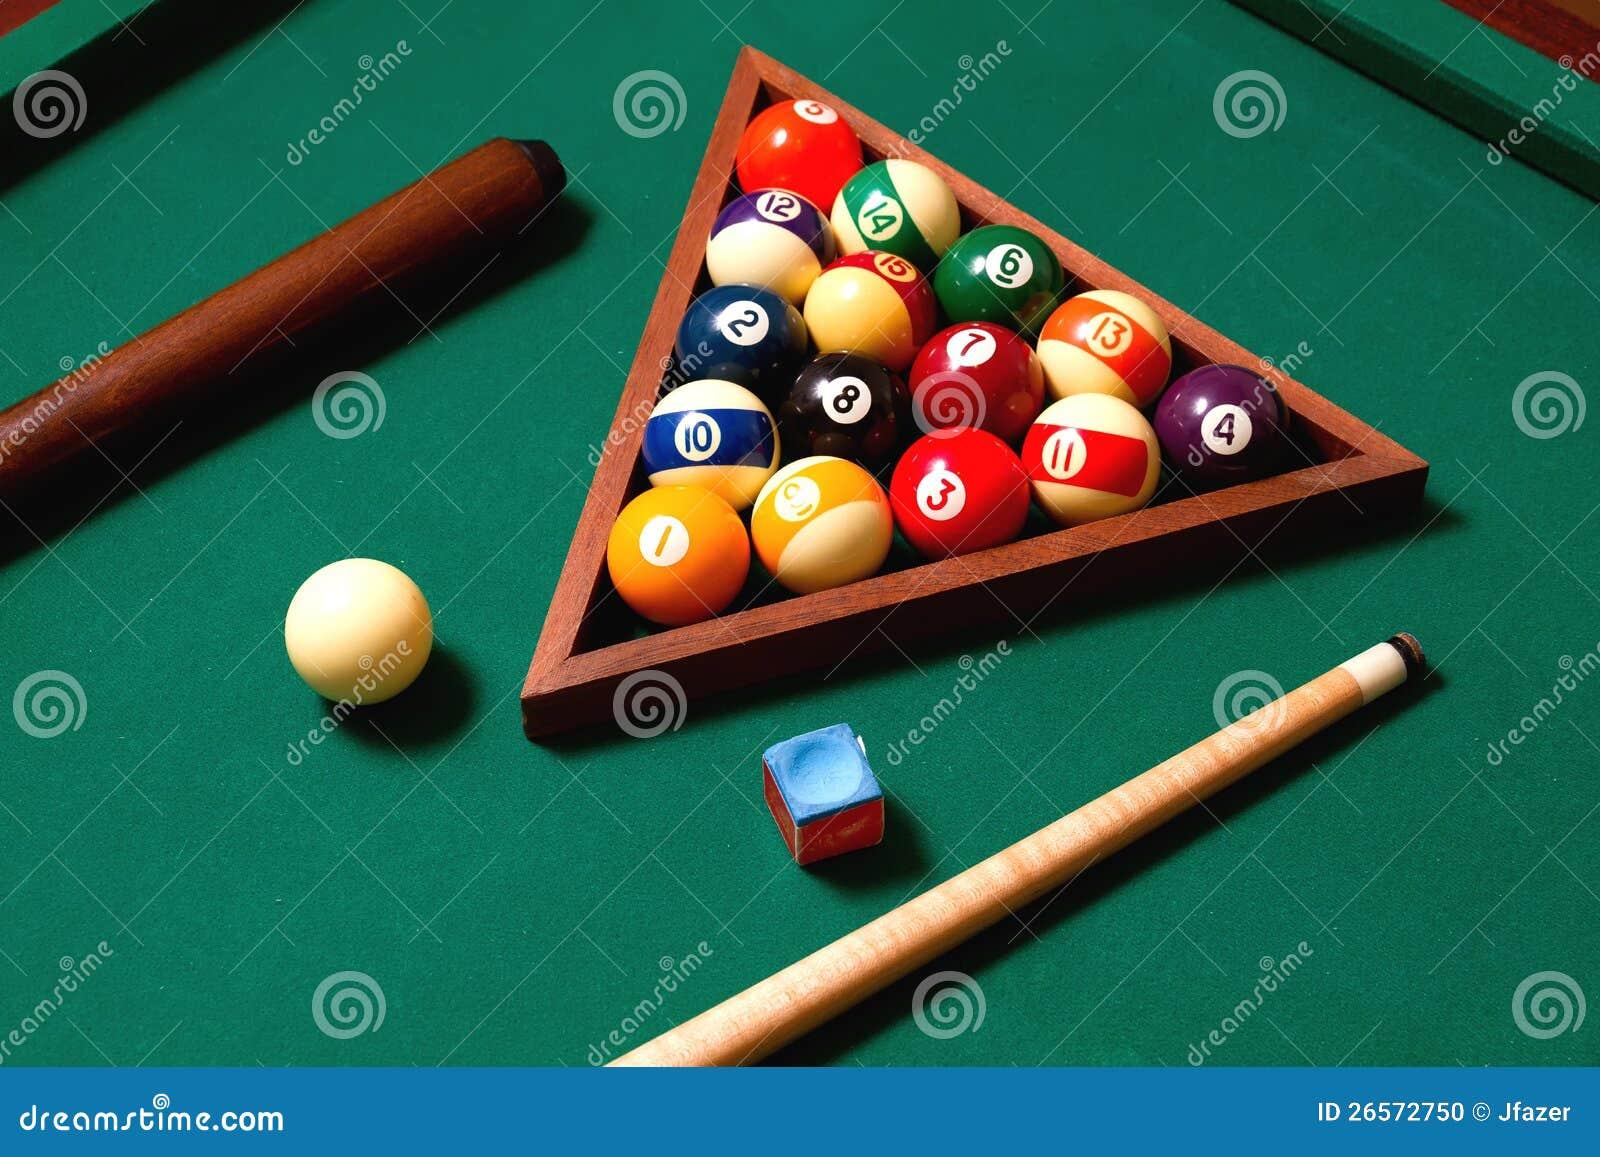 Billiards elements